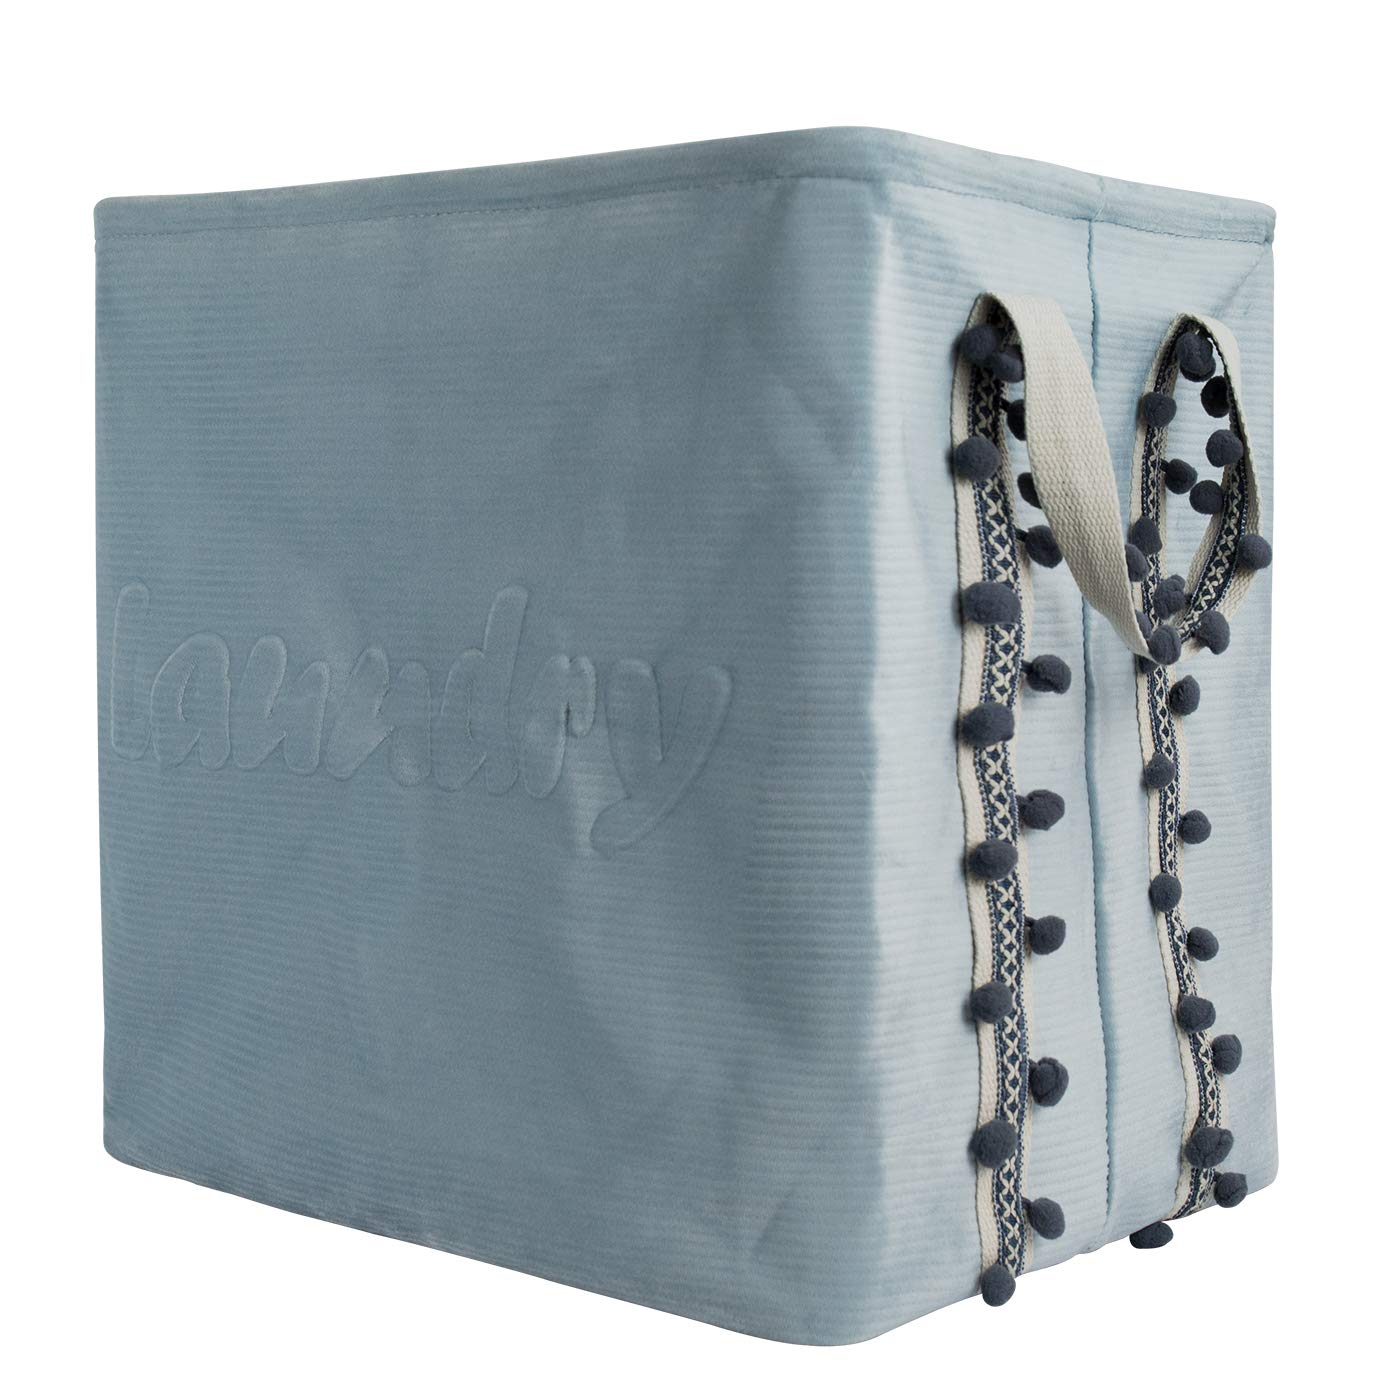 LA JOLIE MUSE Storage Baskets Nursery Hamper – Collapsible Storage Bins Baby Laundry Basket, Foldable Storage Organizer for Toys Clothes,17 x13 x16 Velvet Storage Basket